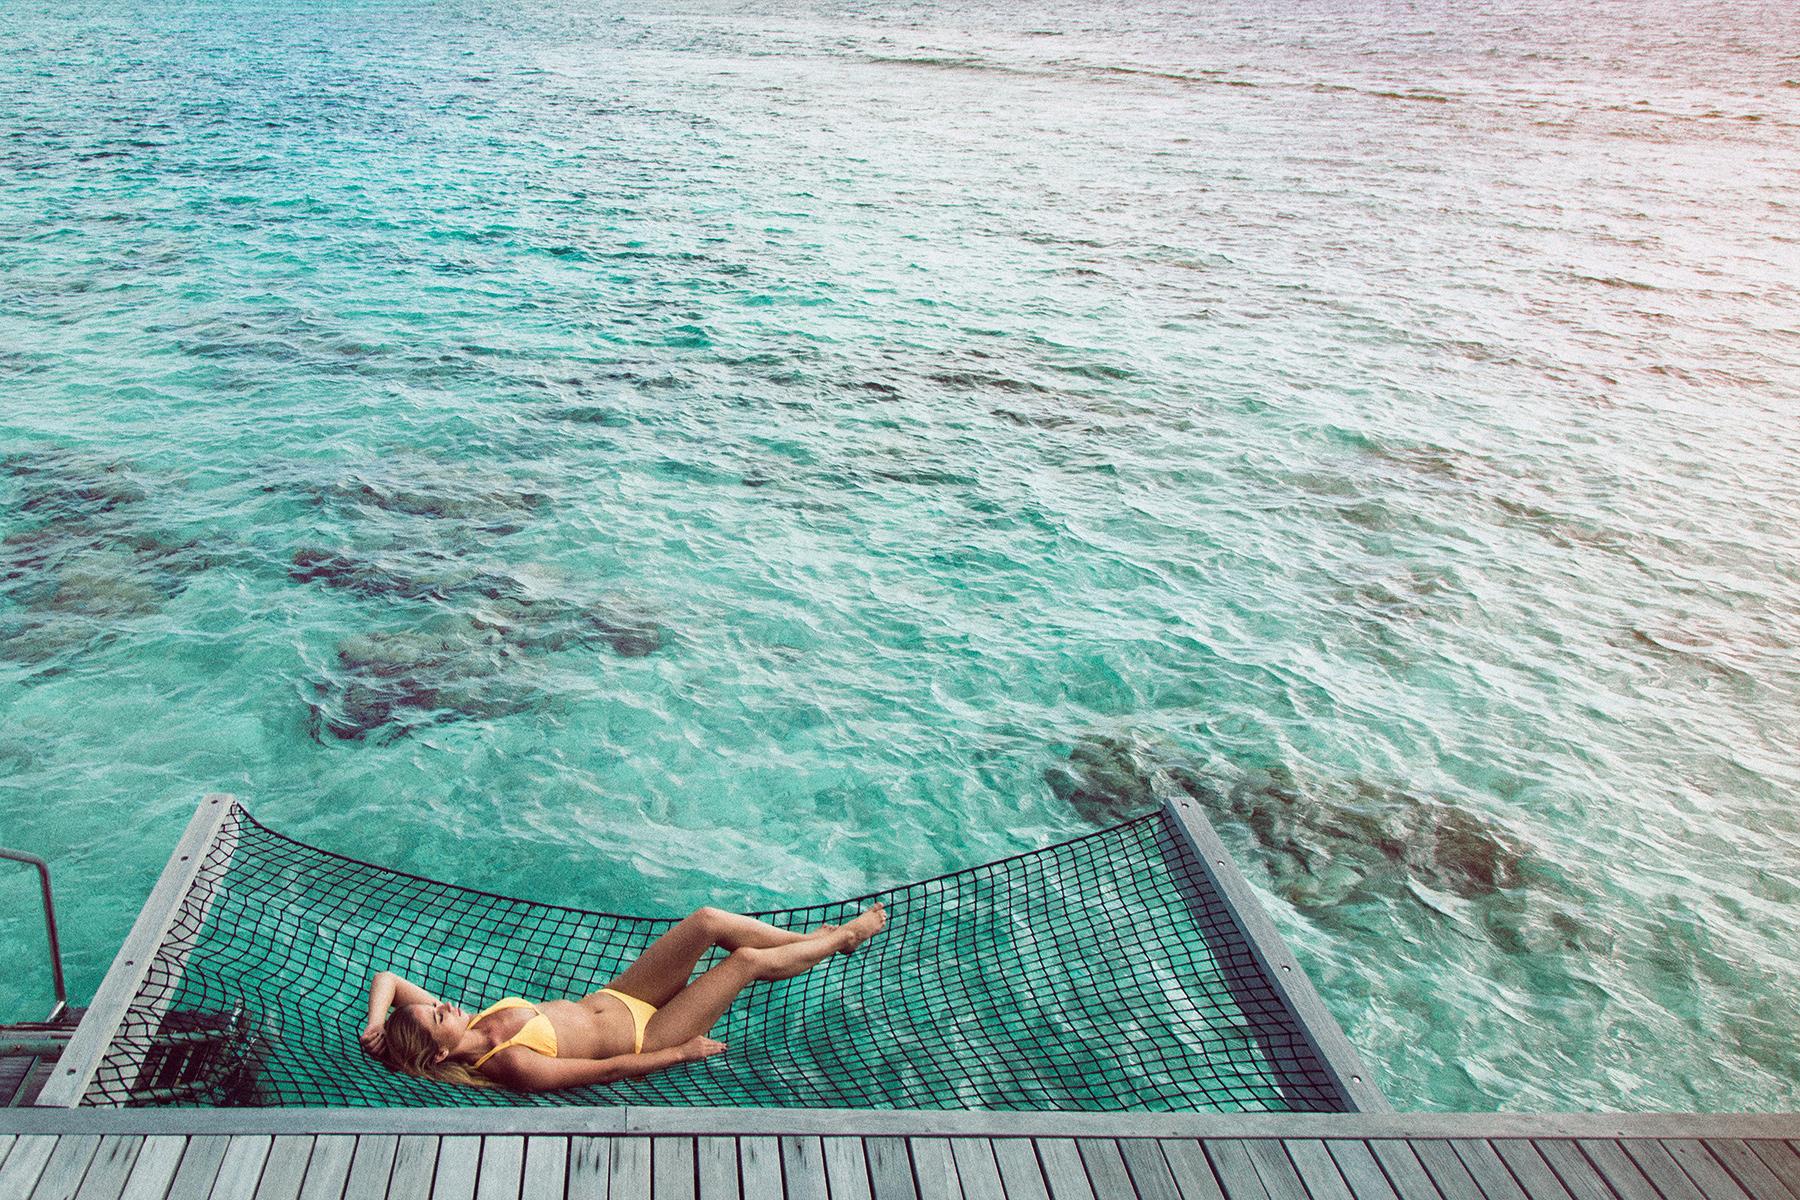 AaronHaxton-maldives-IT0A1900